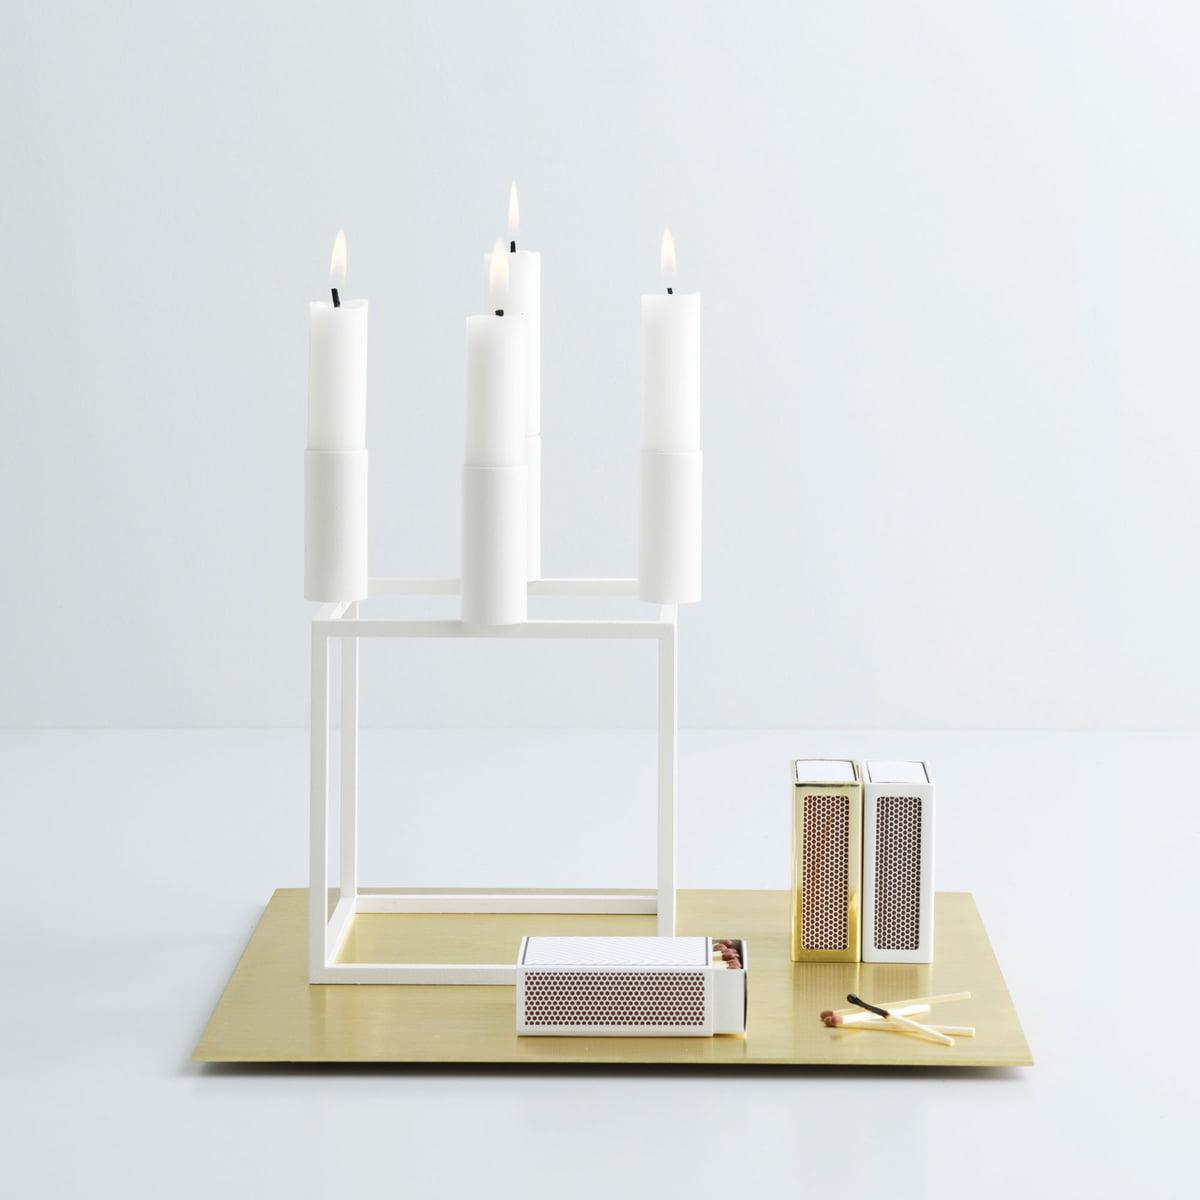 base von by lassen connox. Black Bedroom Furniture Sets. Home Design Ideas